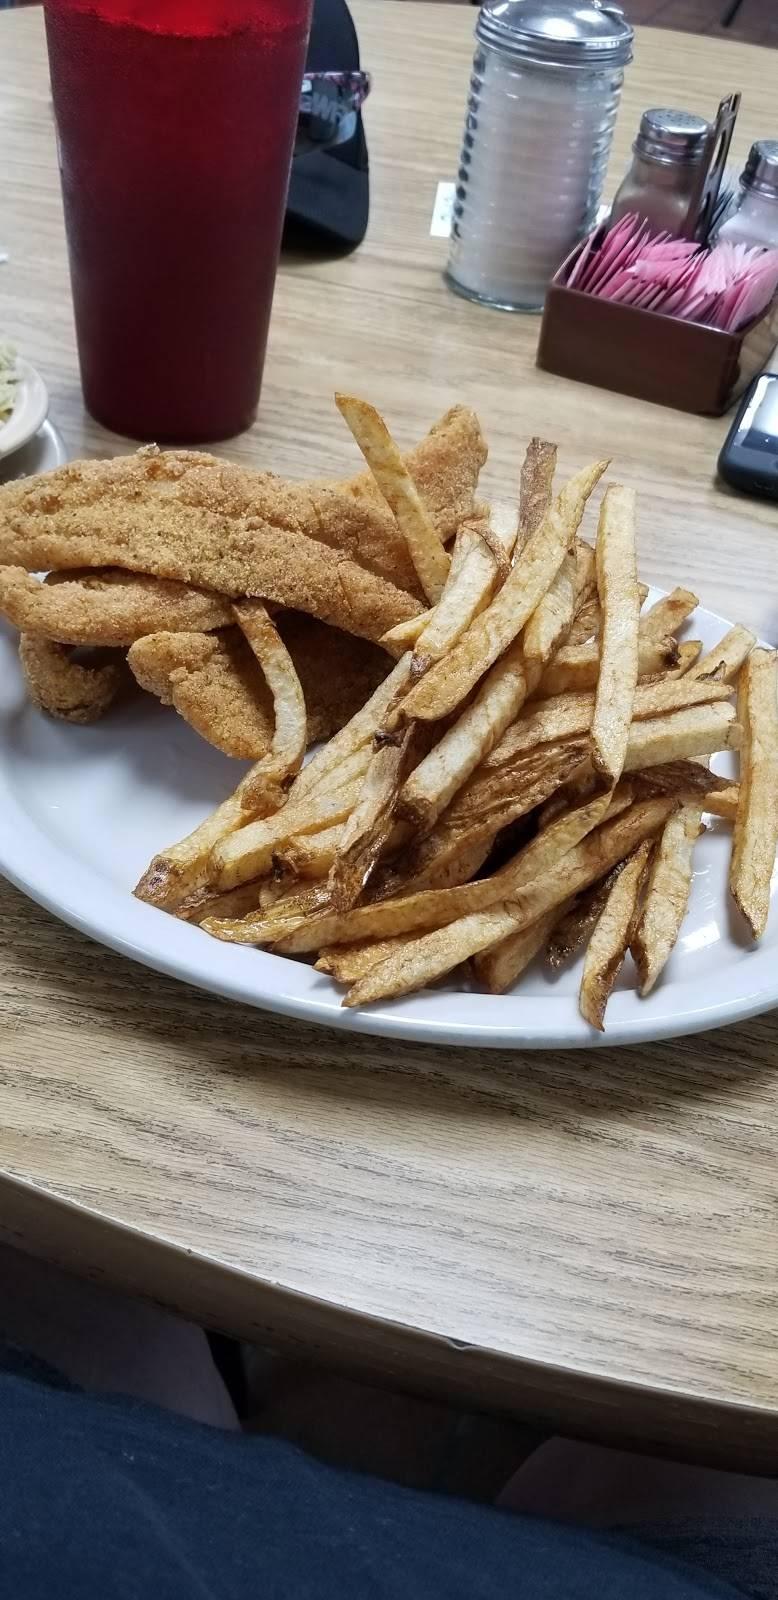 Hitchin Post Restaurant | restaurant | 3707 I-35, Gainesville, TX 76240, USA | 9406659400 OR +1 940-665-9400